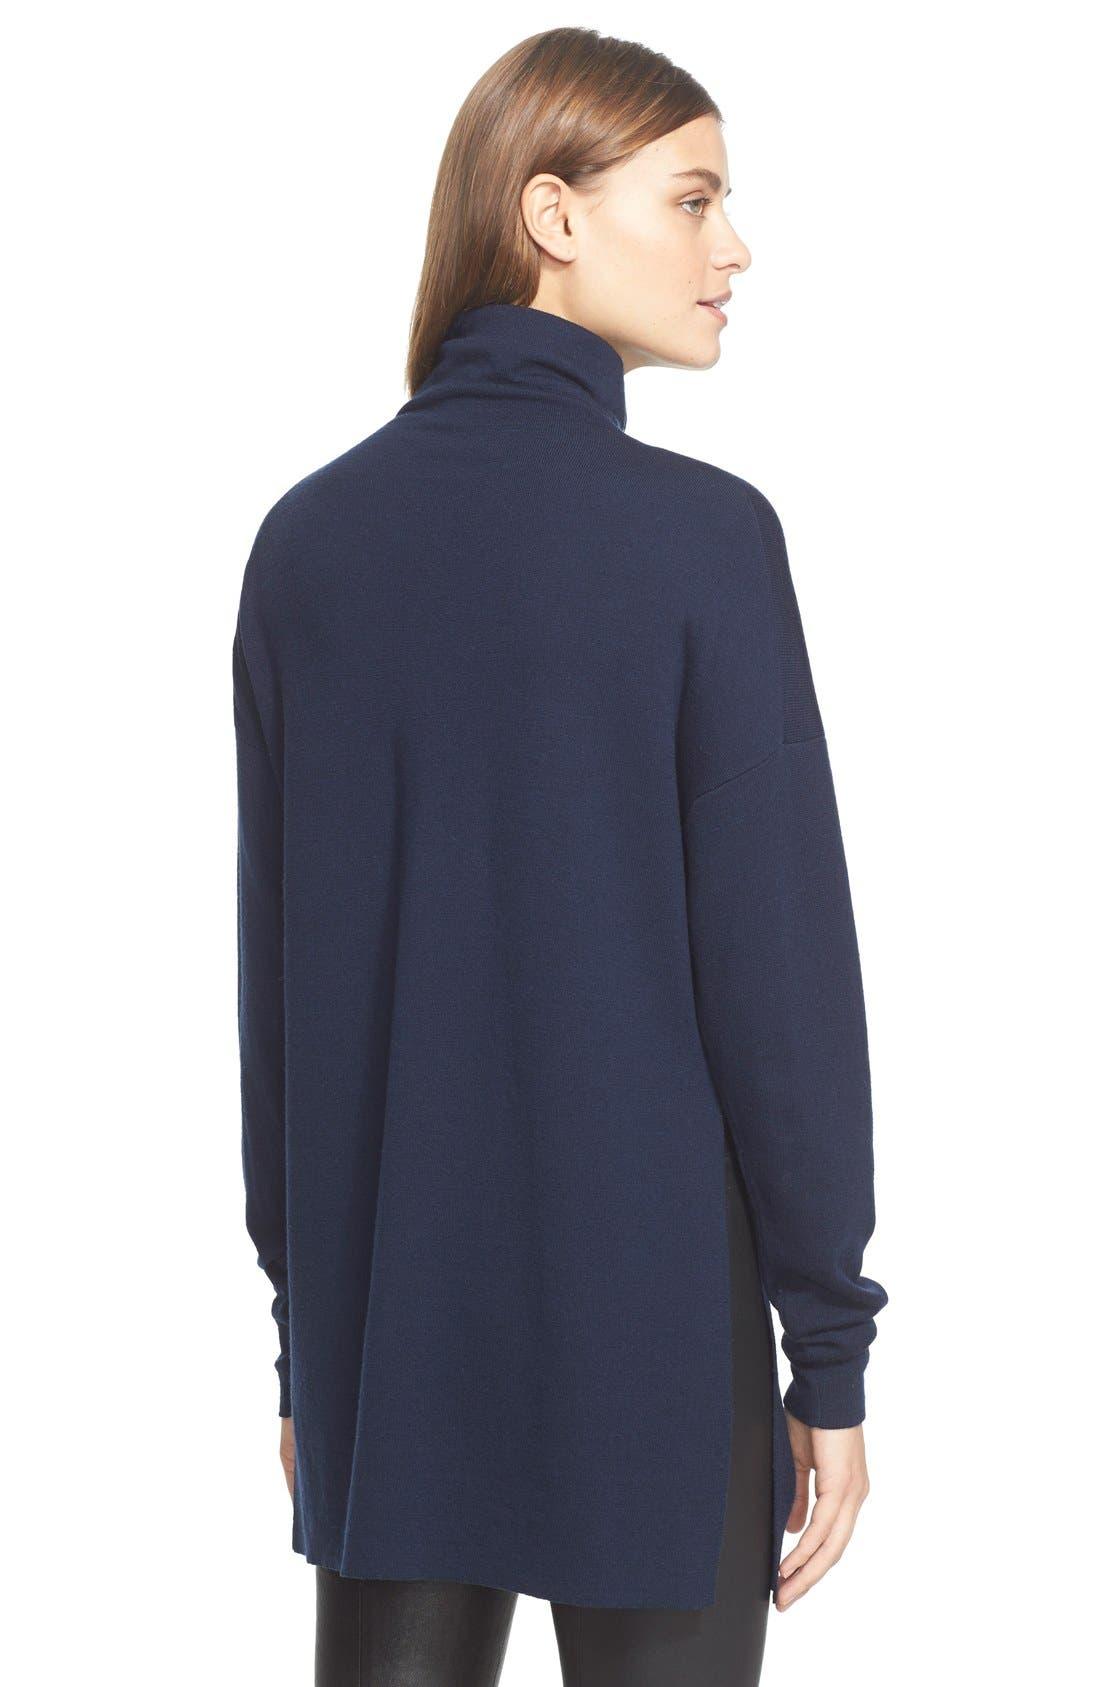 Turtleneck Sweater,                             Alternate thumbnail 2, color,                             402